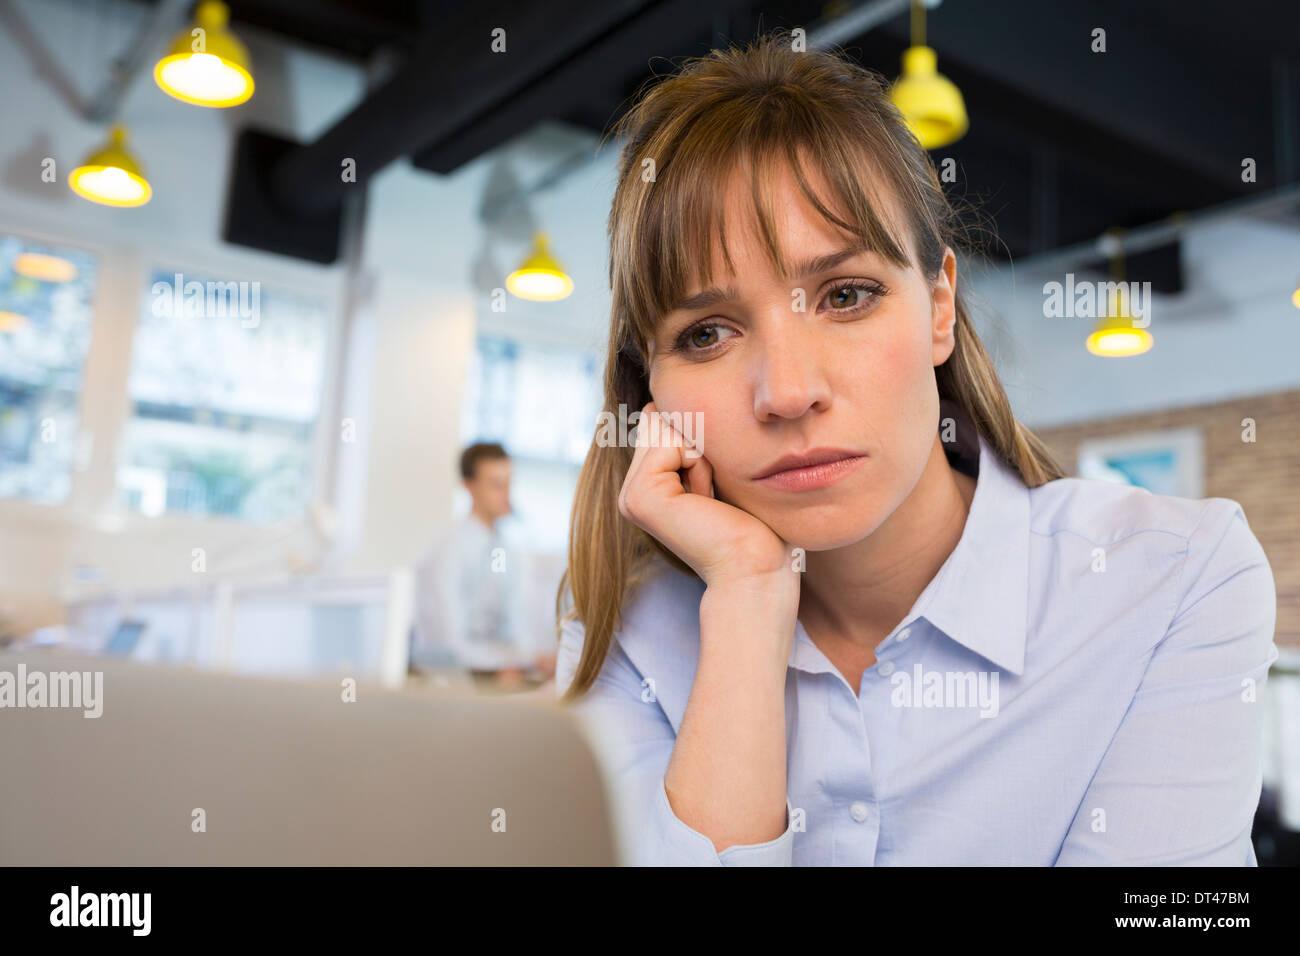 Cansado de negocios femenina equipo de escritorio Imagen De Stock